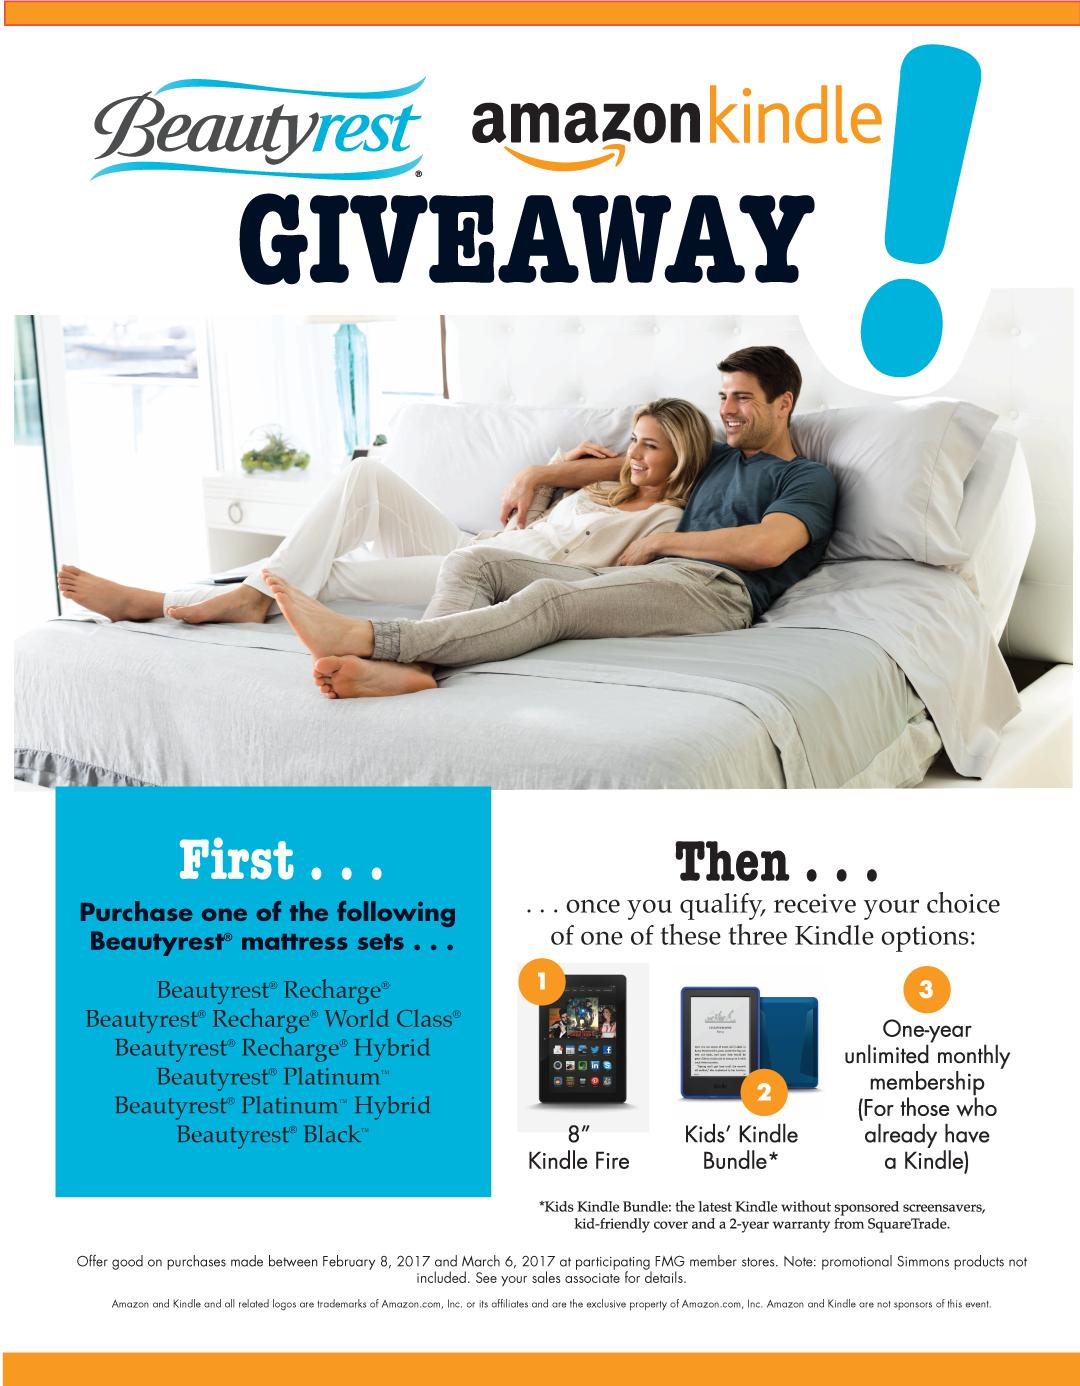 Beautyrest Amazon Kindle Giveaway at !Dealername